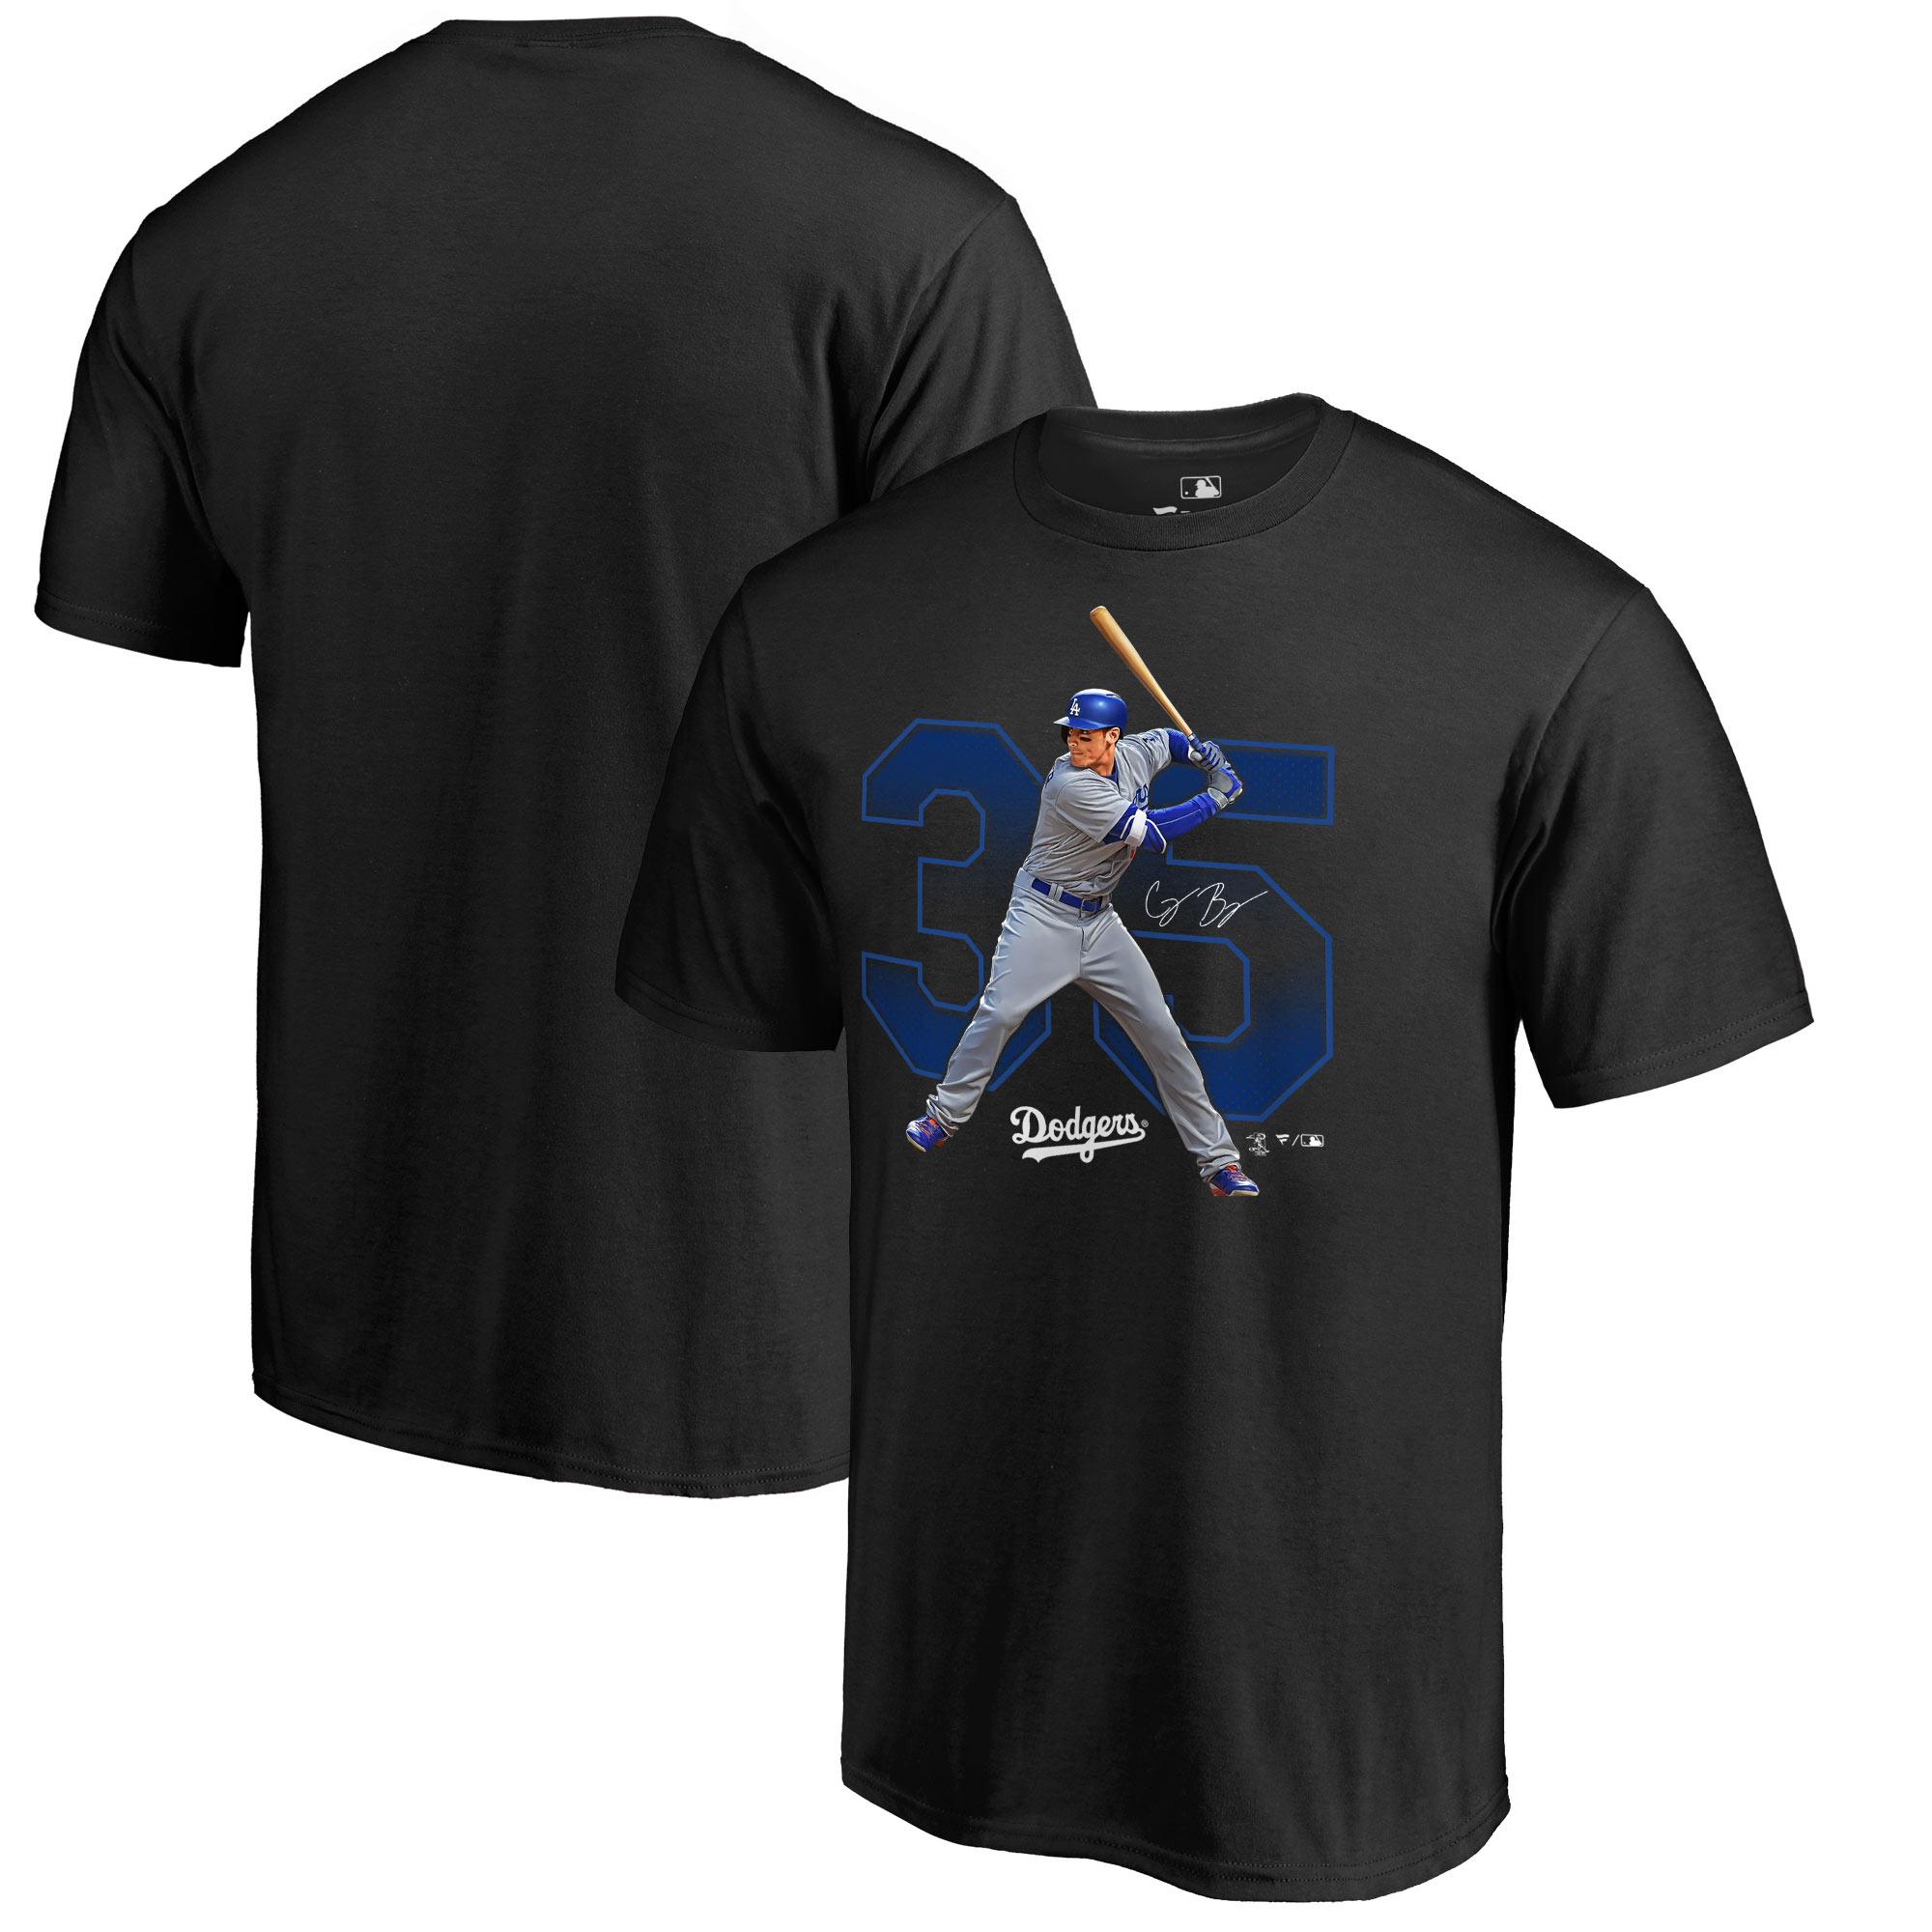 Cody Bellinger Los Angeles Dodgers Fanatics Branded Power House T-Shirt - Black